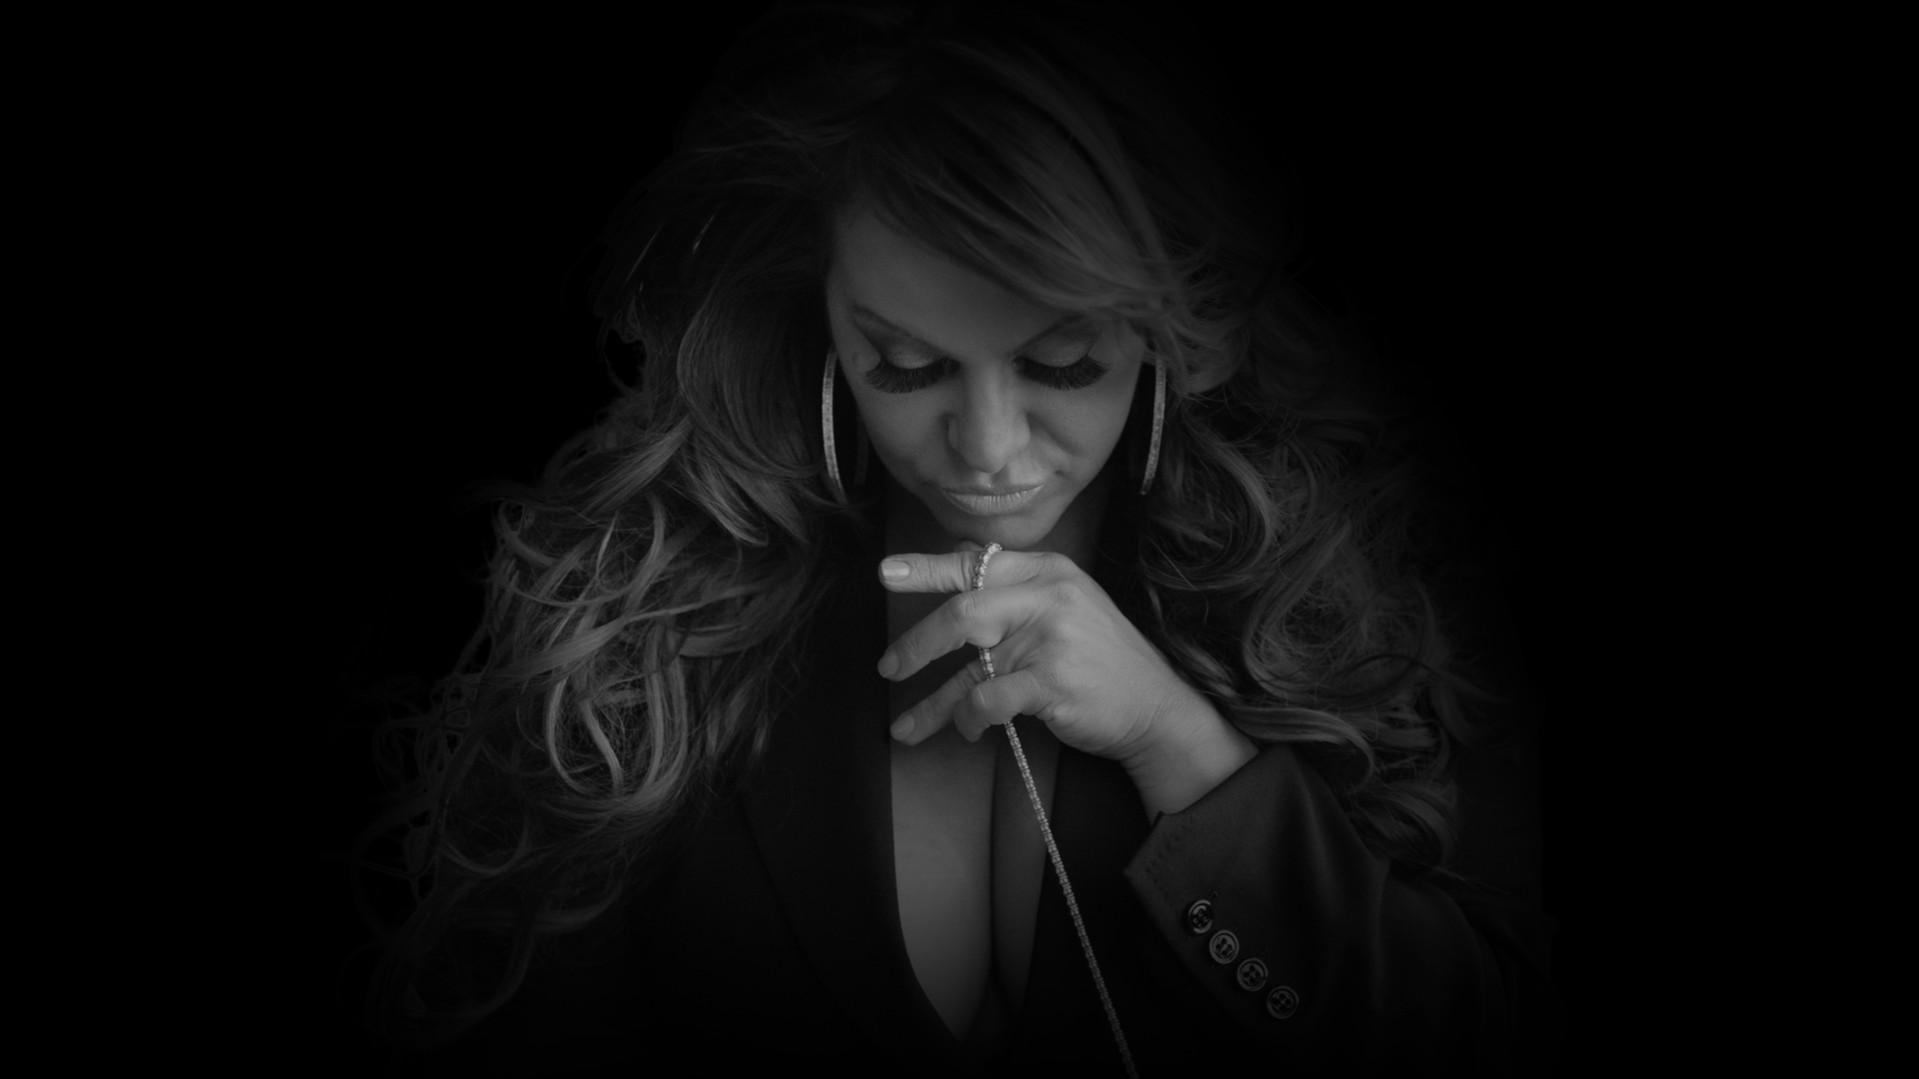 Jenni Black&White copy.jpg